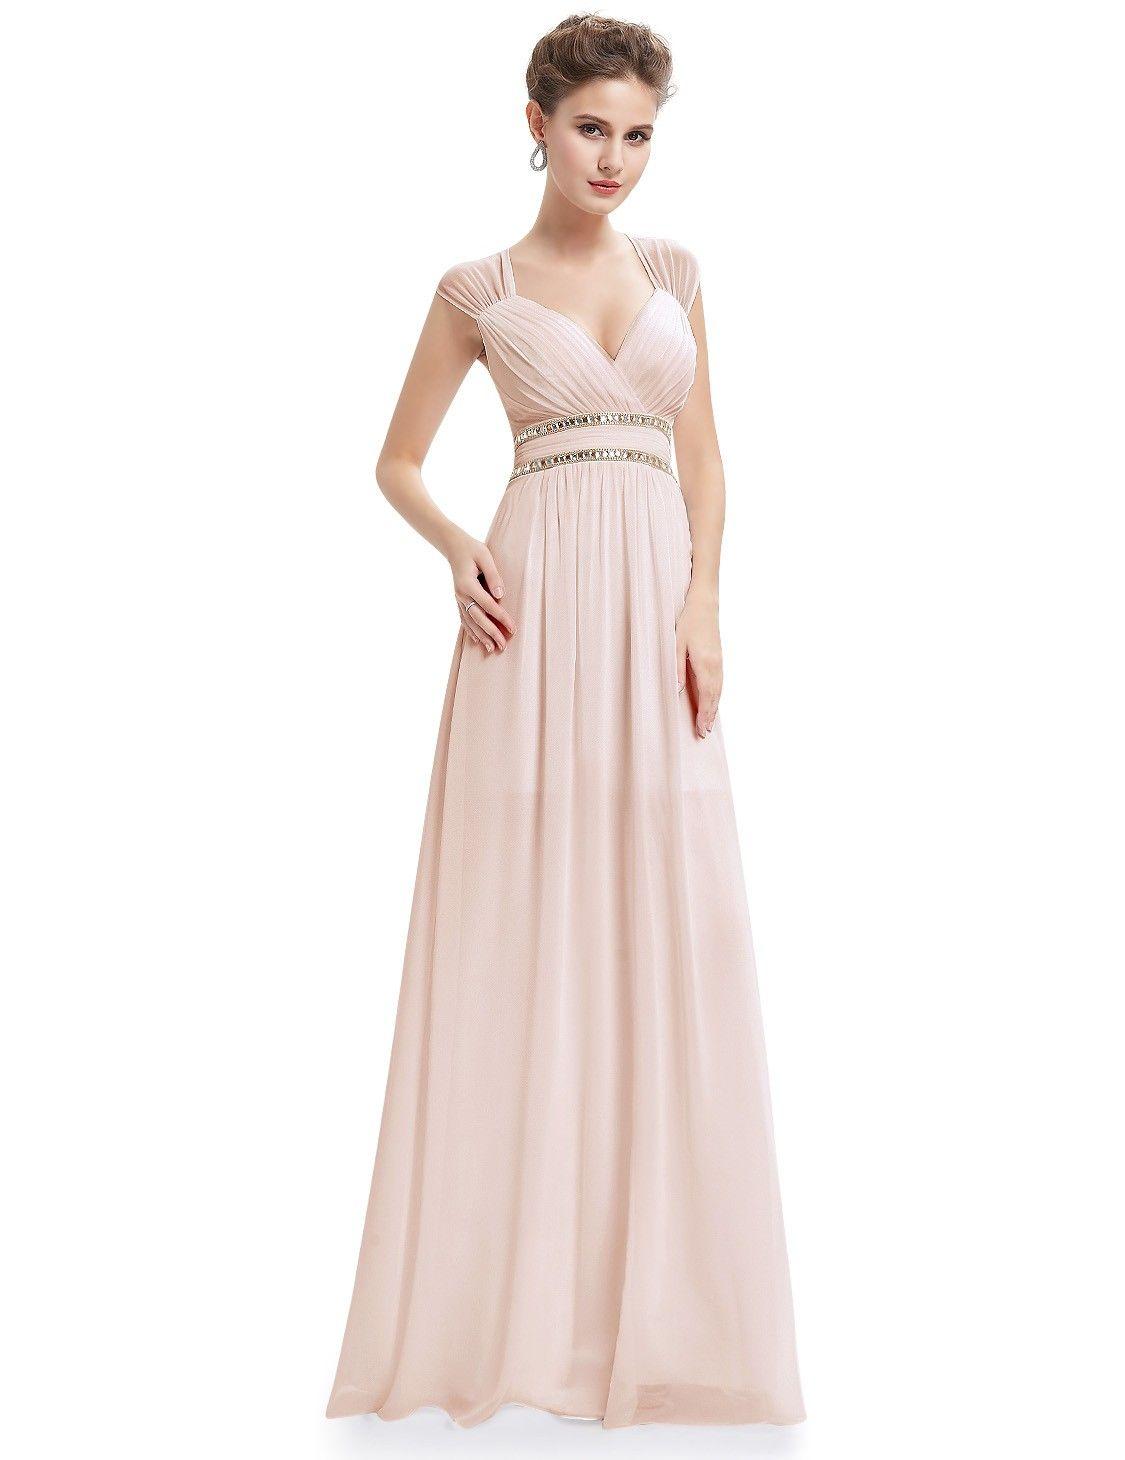 529bc8c44d Sleeveless Grecian Style Evening Dress